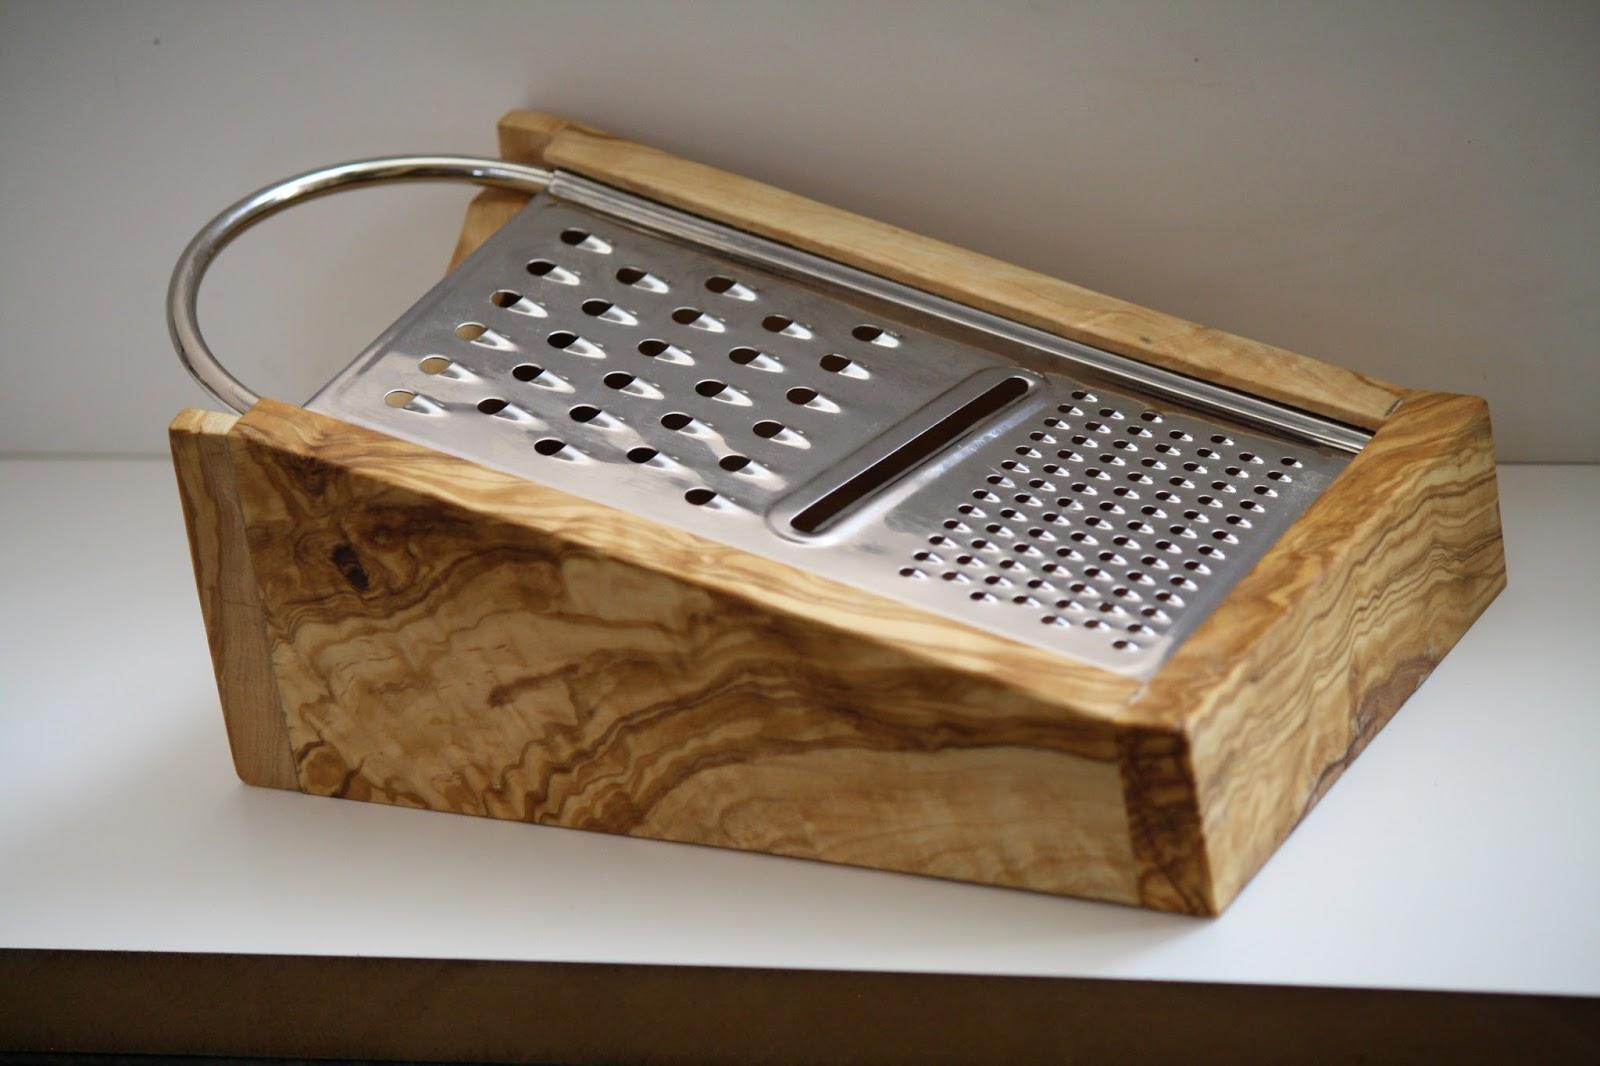 Artesania en madera de olivo utensilios de cocina 1 for Utensilios cocina